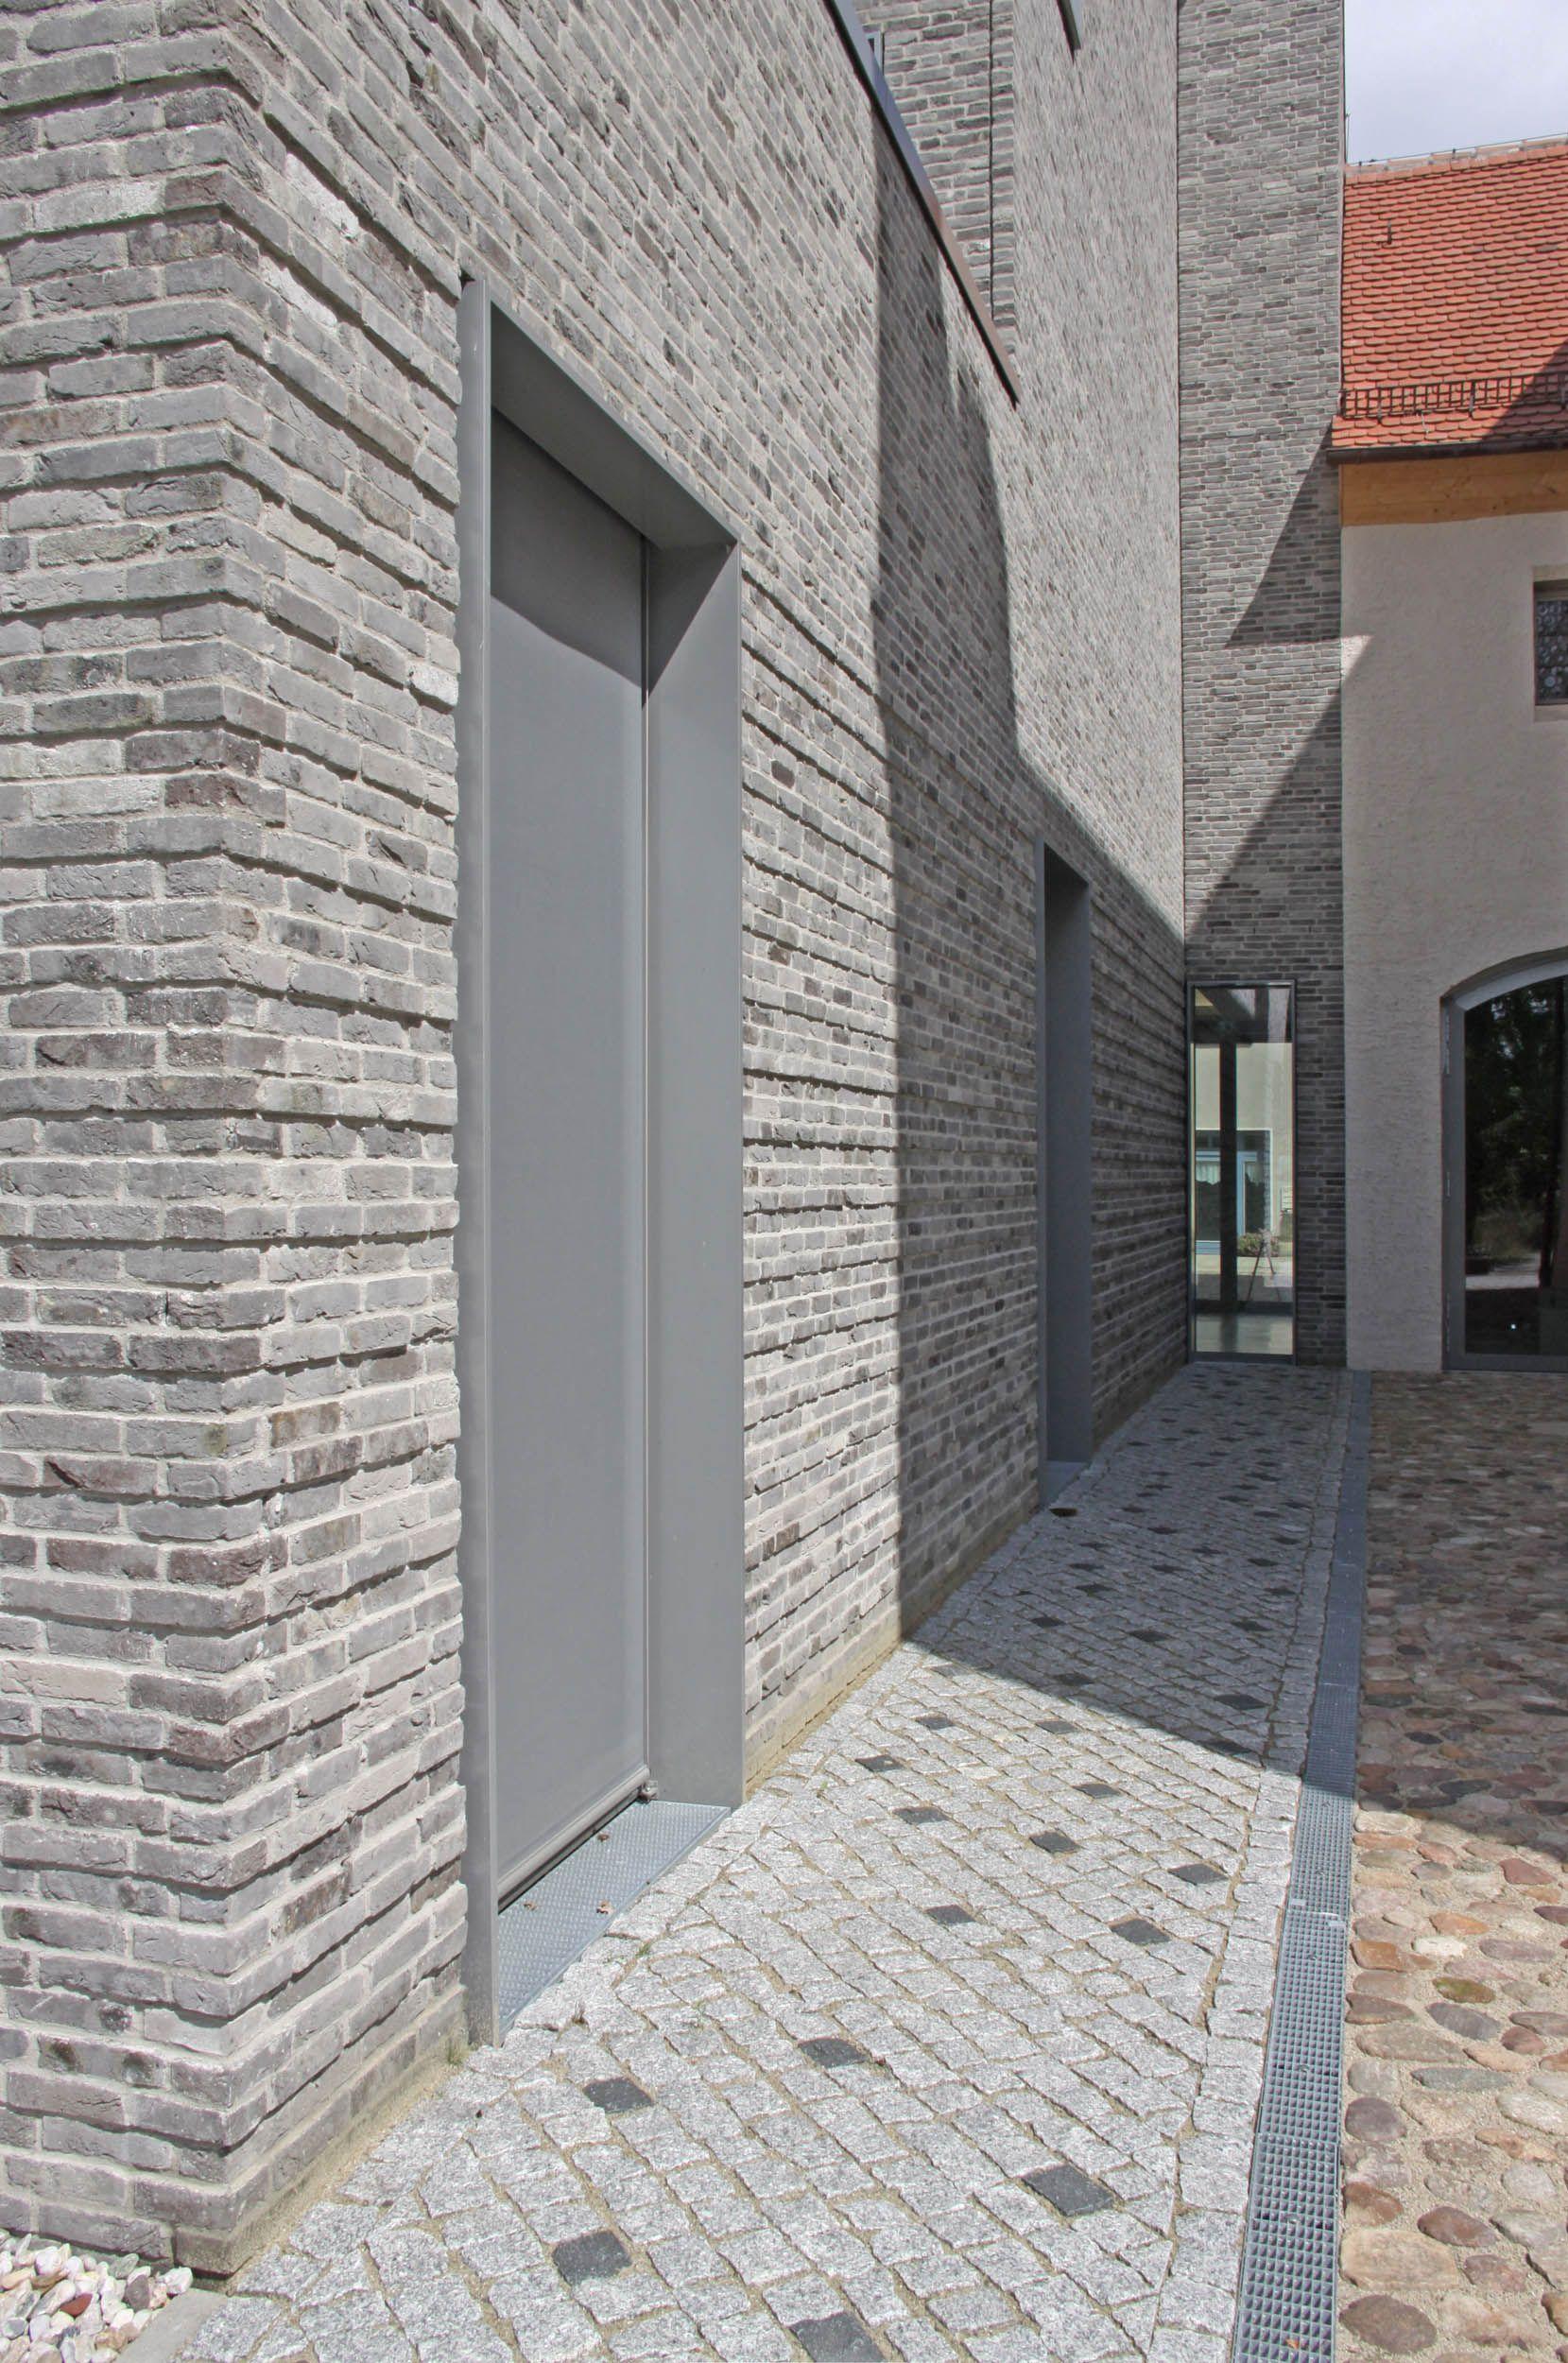 melanchthonhaus wittenberg detail hoffassade n bleul. Black Bedroom Furniture Sets. Home Design Ideas